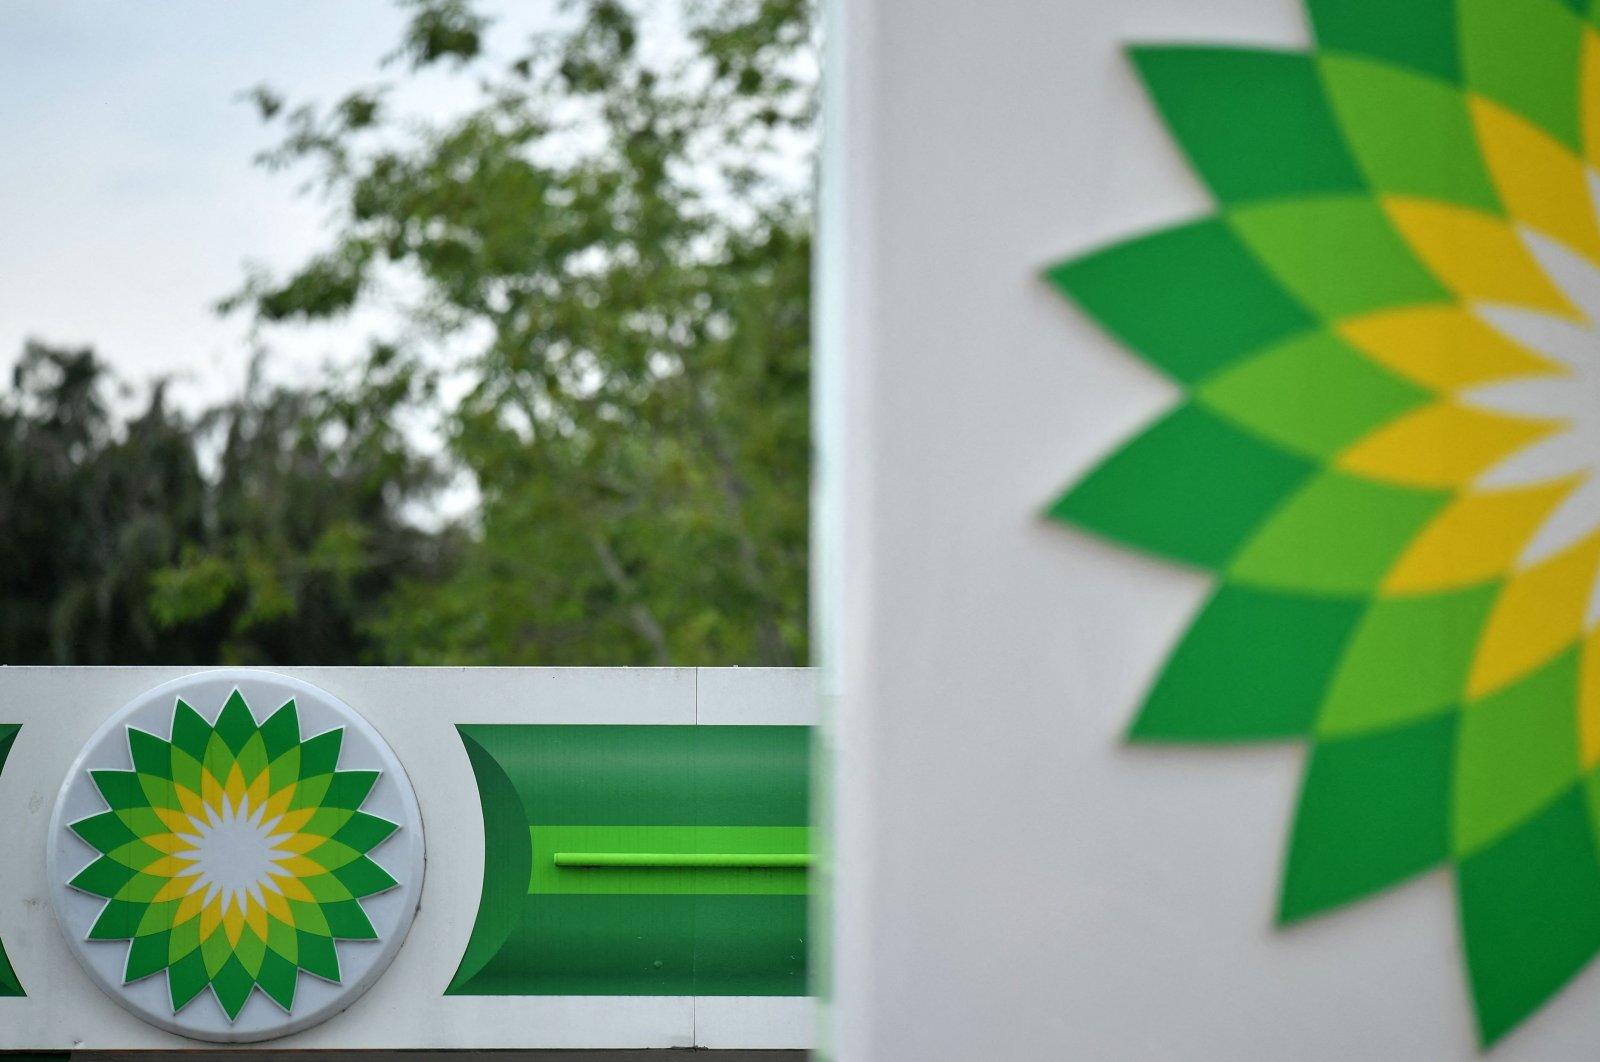 BP logos are seen at a BP petrol and diesel filling station in Hildenborough, south-east of London, U.K., June 15, 2020. (AFP Photo)